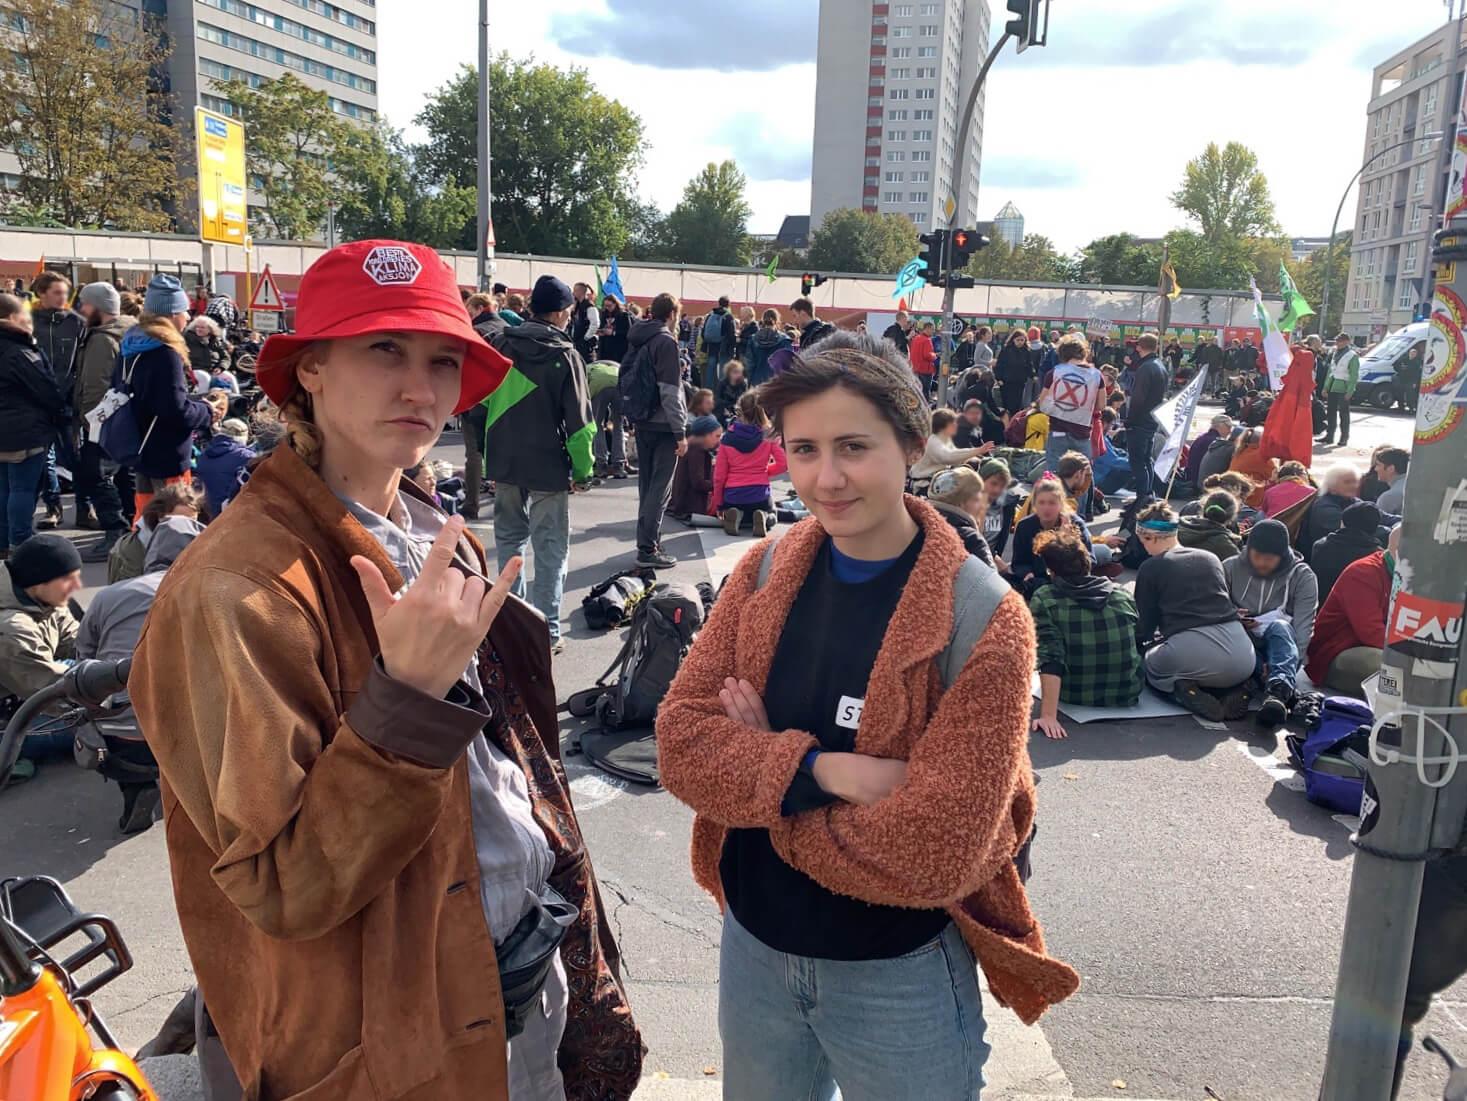 Stoff er med når Extinction Rebellion okkuperer Großer Stern. FOTO: Morgane Fauconnier